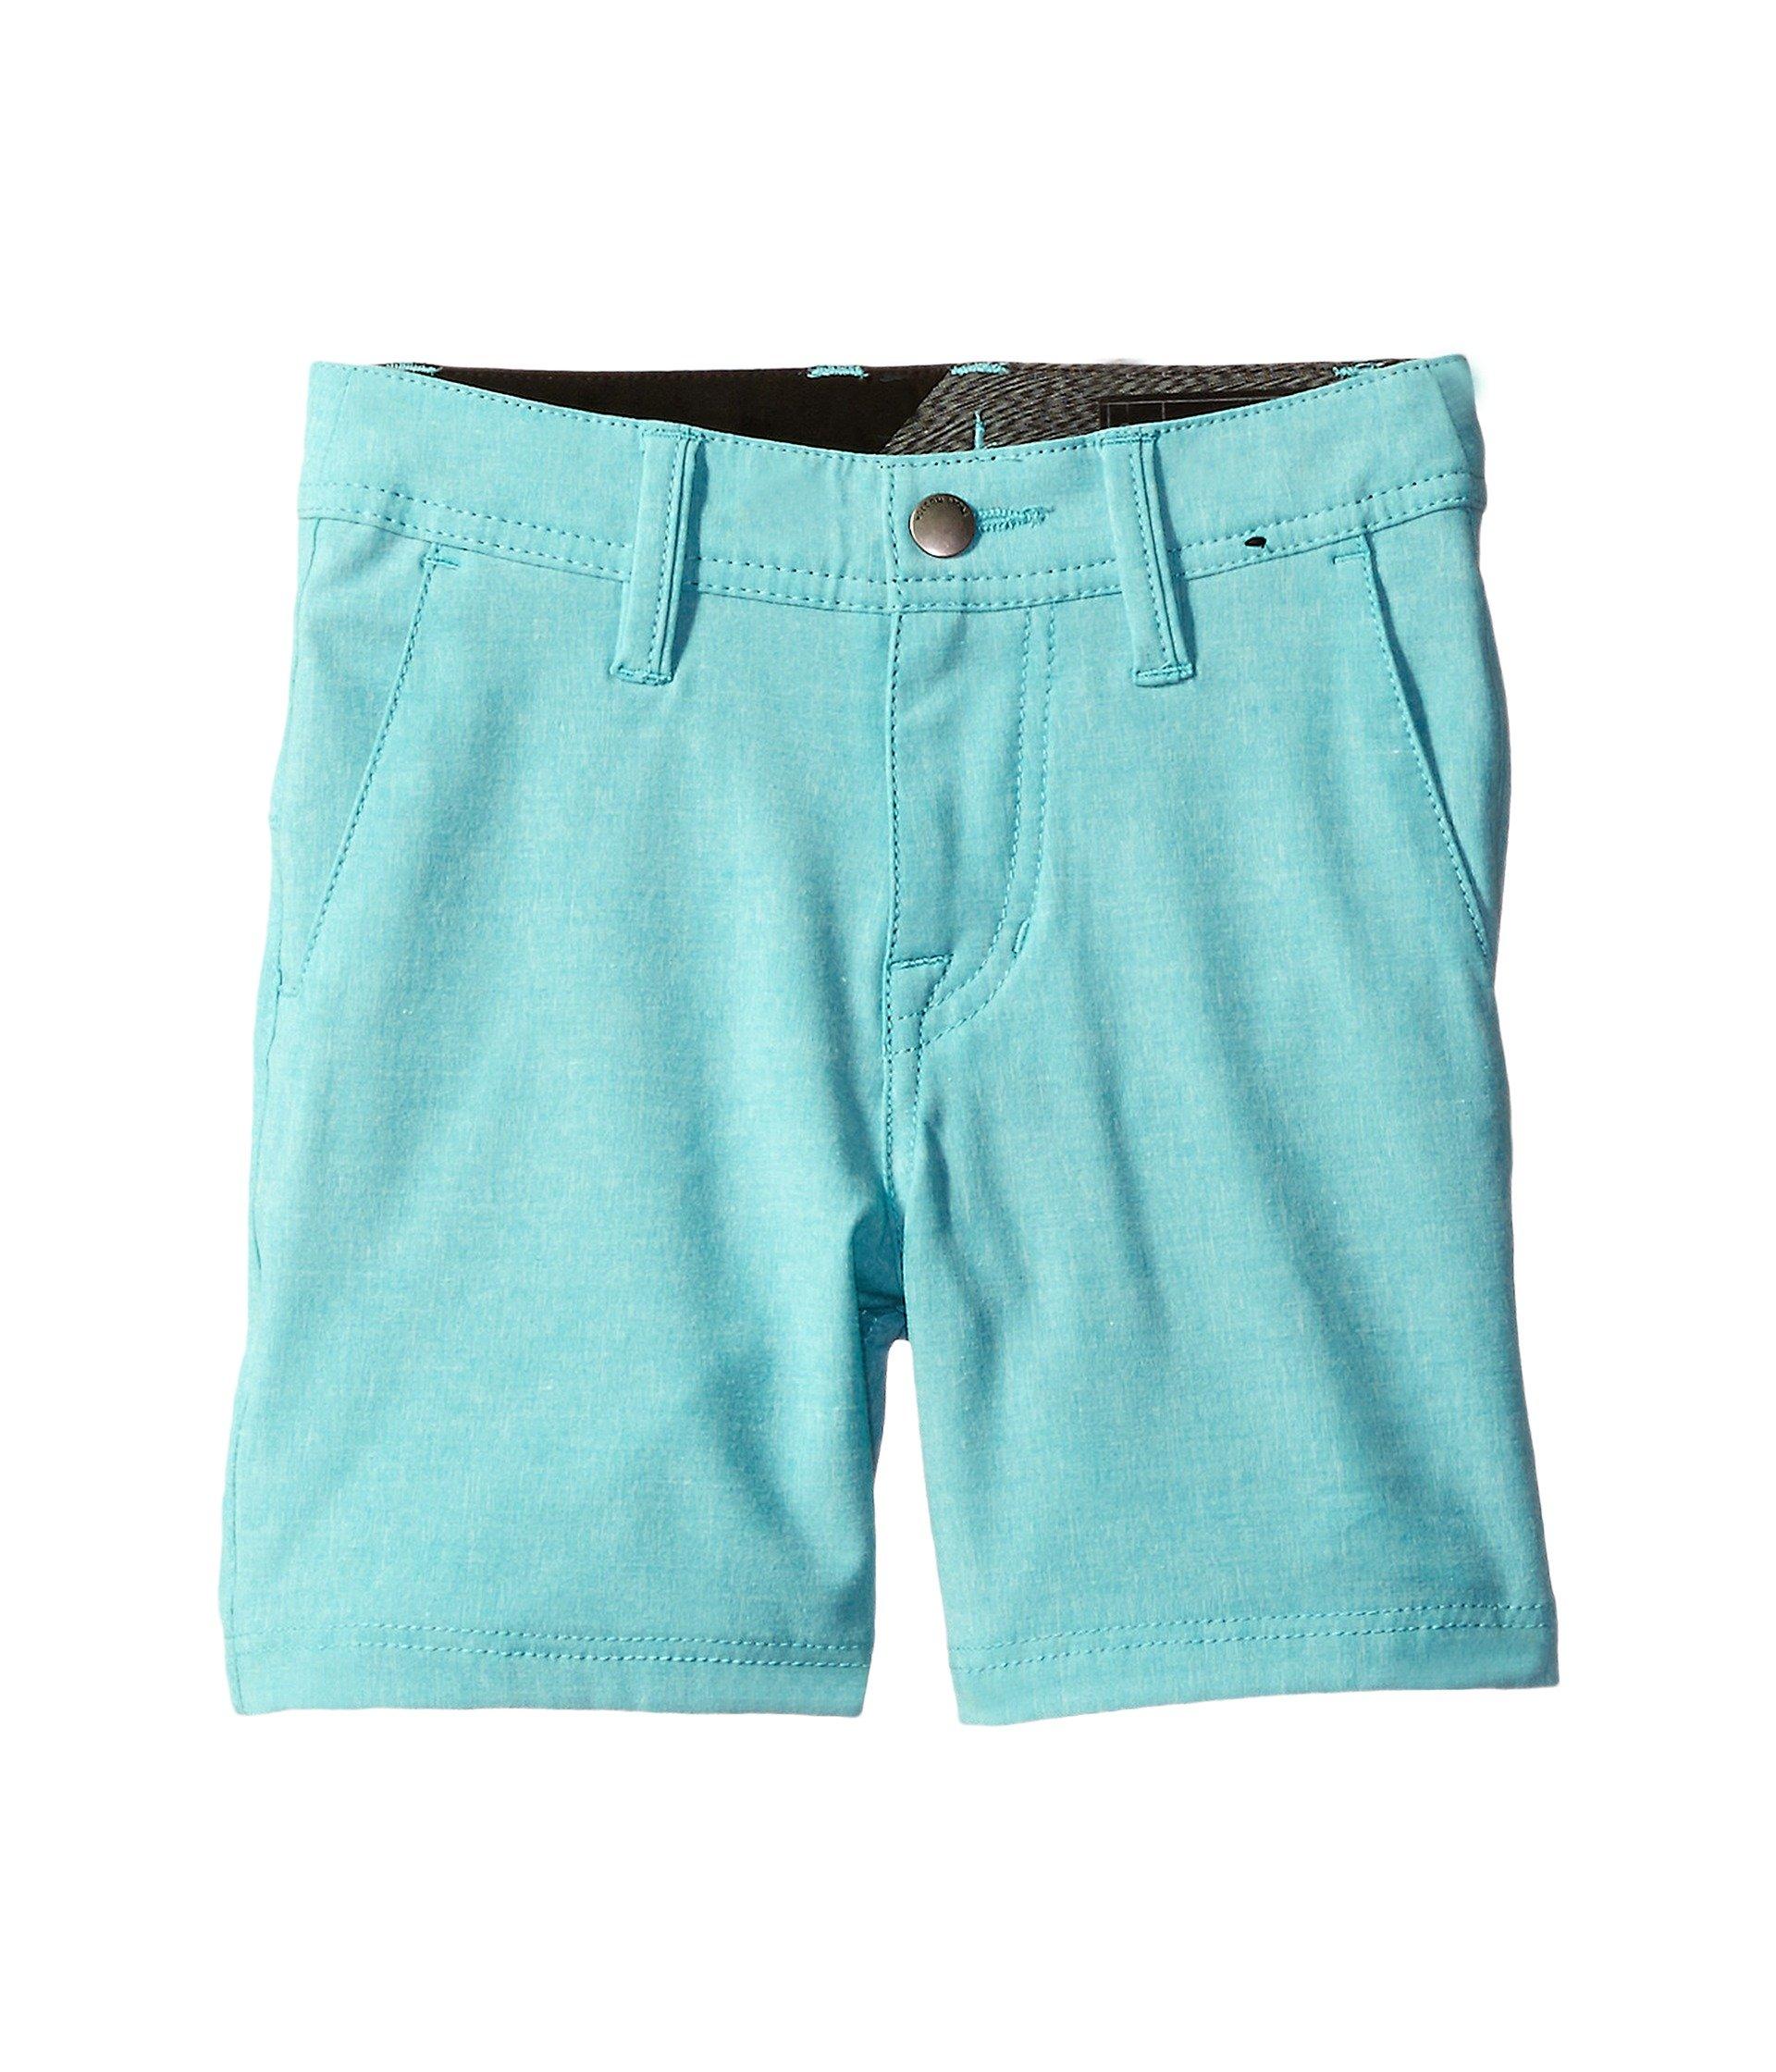 Pantaloneta para Niño Volcom Kids Frickin SNT Static Shorts (Toddler/Little Kids)  + Volcom en VeoyCompro.net